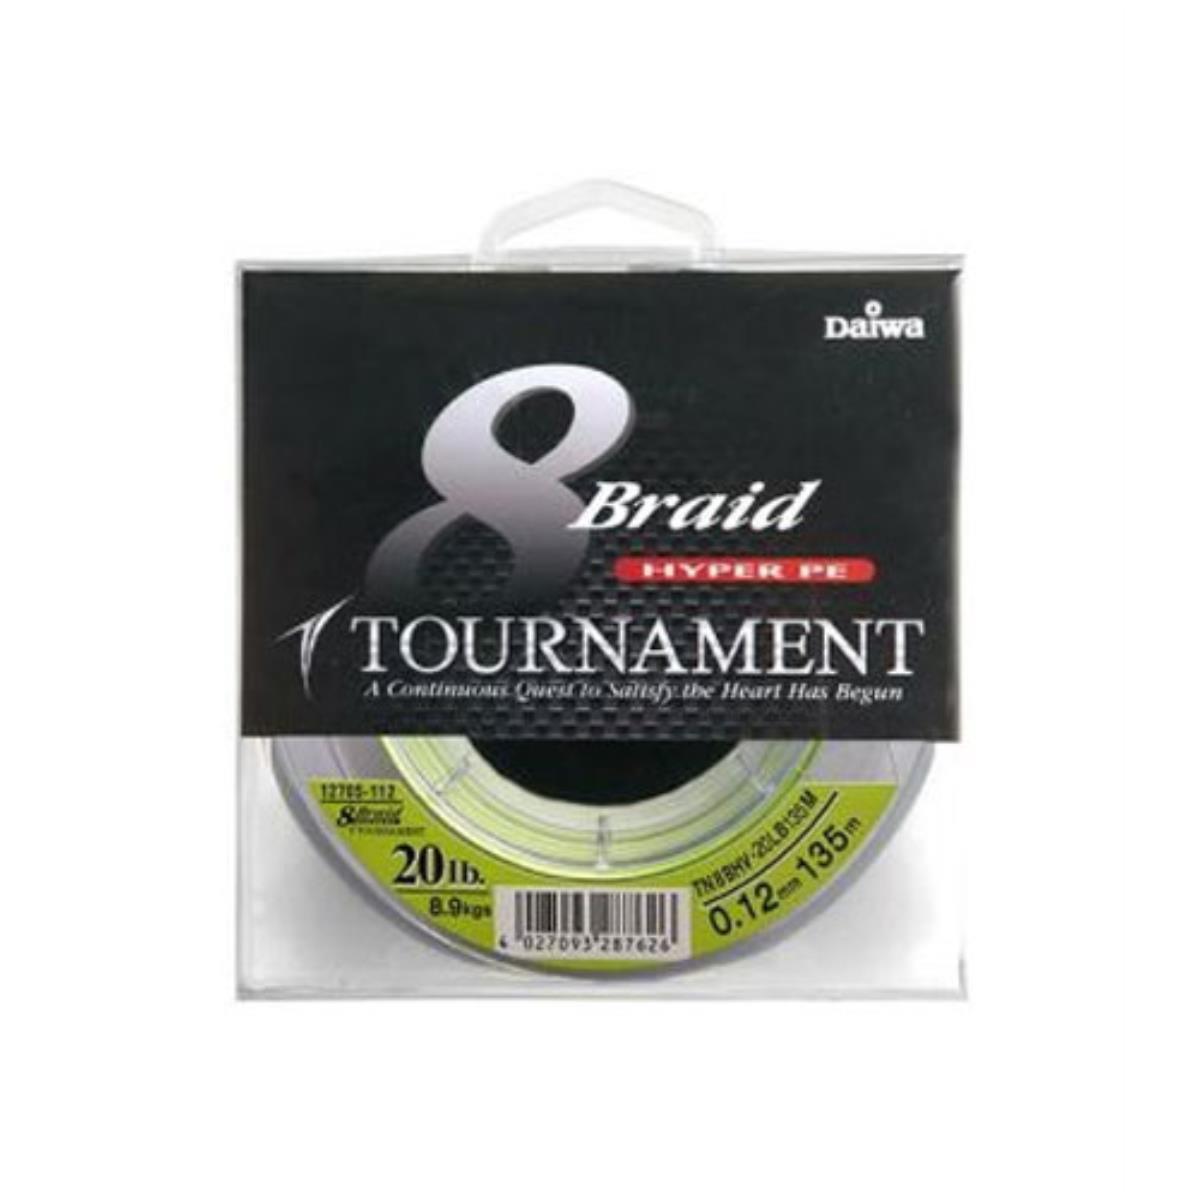 Cable de torneo Daiwa 8 xbraid verde oscuro 0,12mm 135 M #